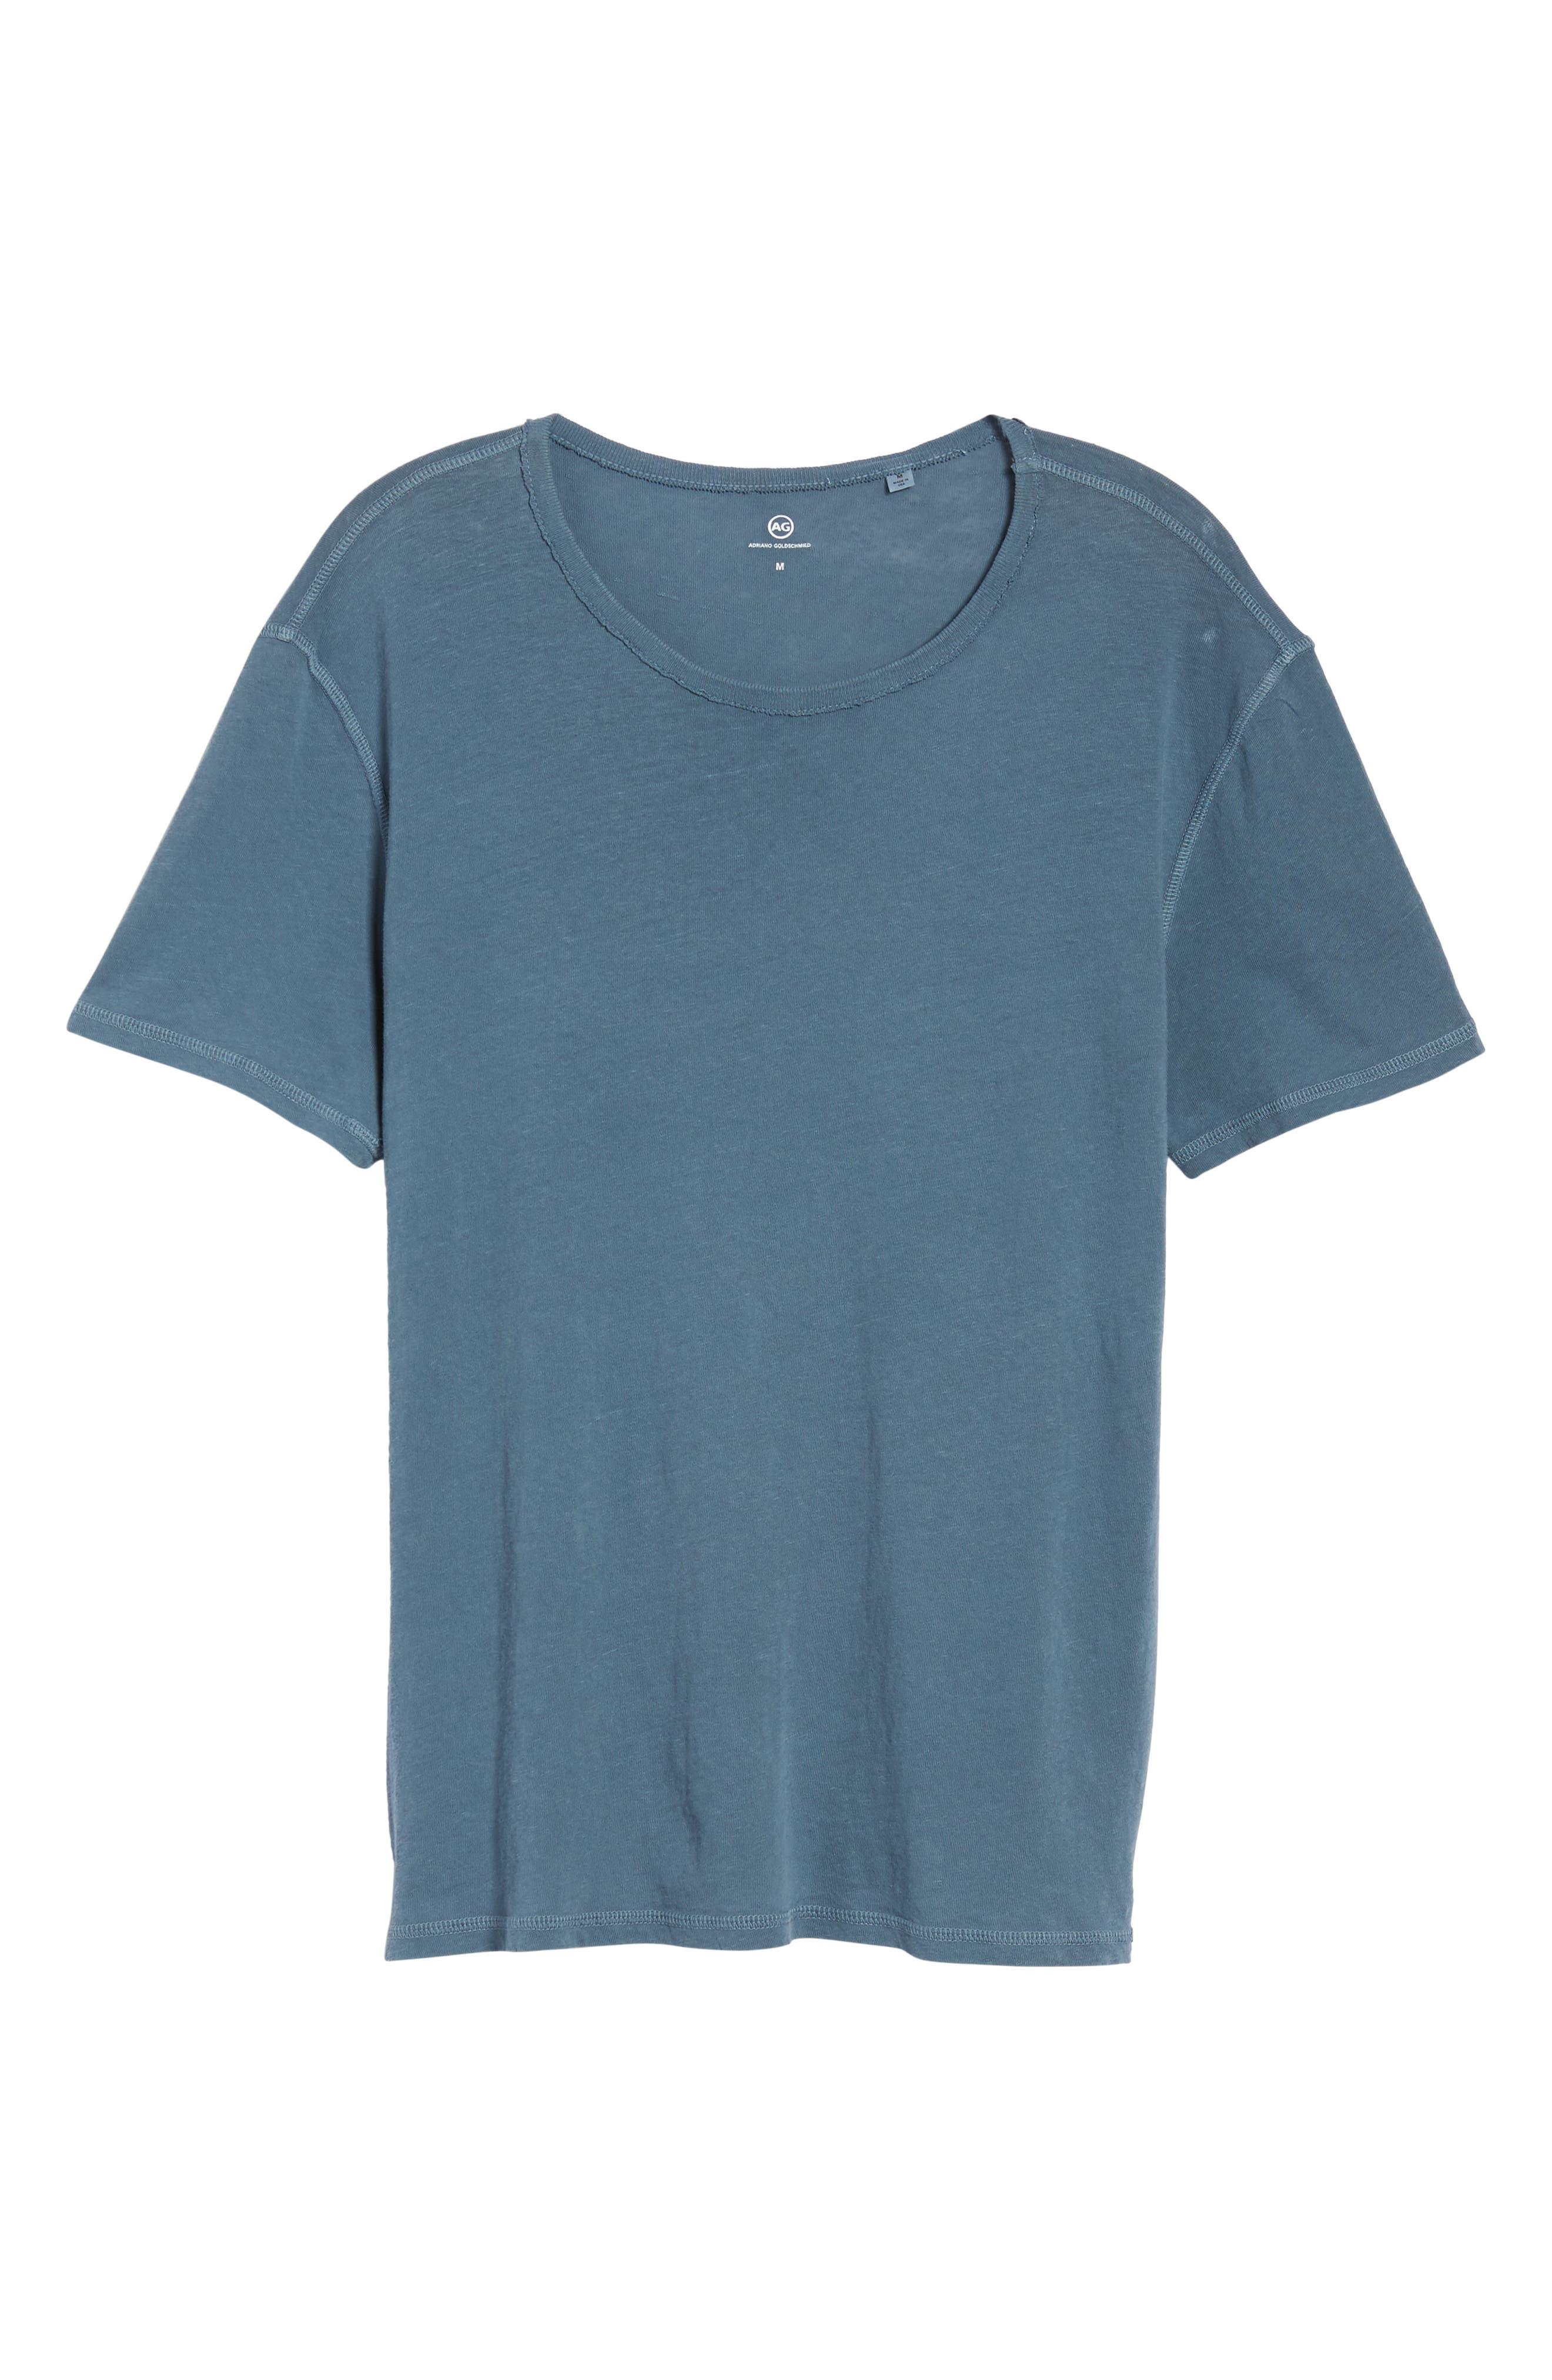 Ramsey Slim Fit Crewneck T-Shirt,                             Main thumbnail 1, color,                             Weathered Pacific Coast